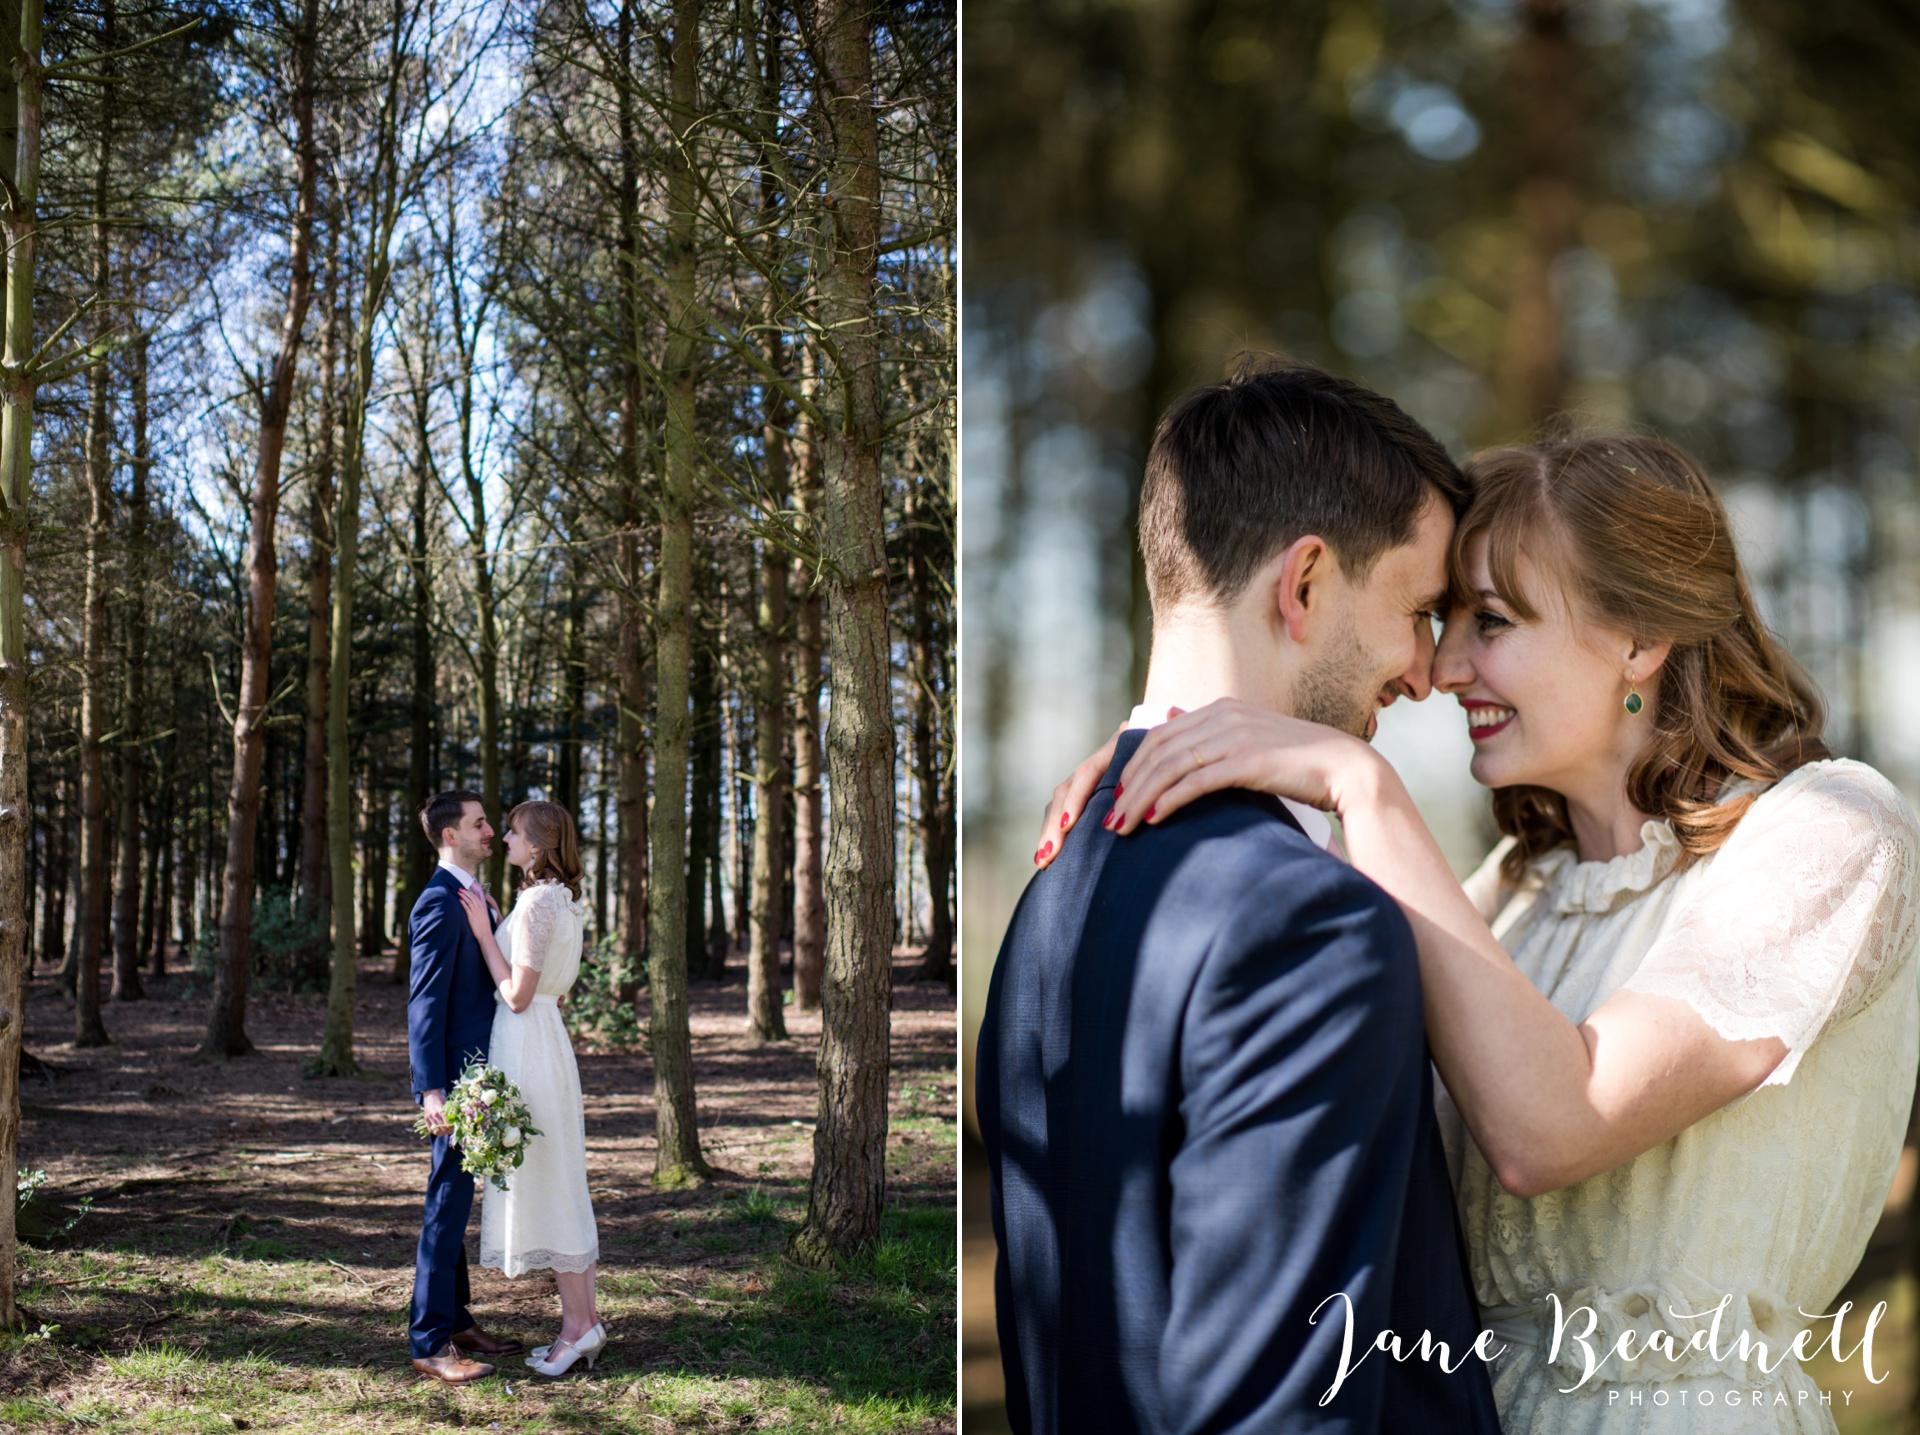 Jane Beadnell fine art wedding photographer The Cheerful Chilli Barn Otley_0031